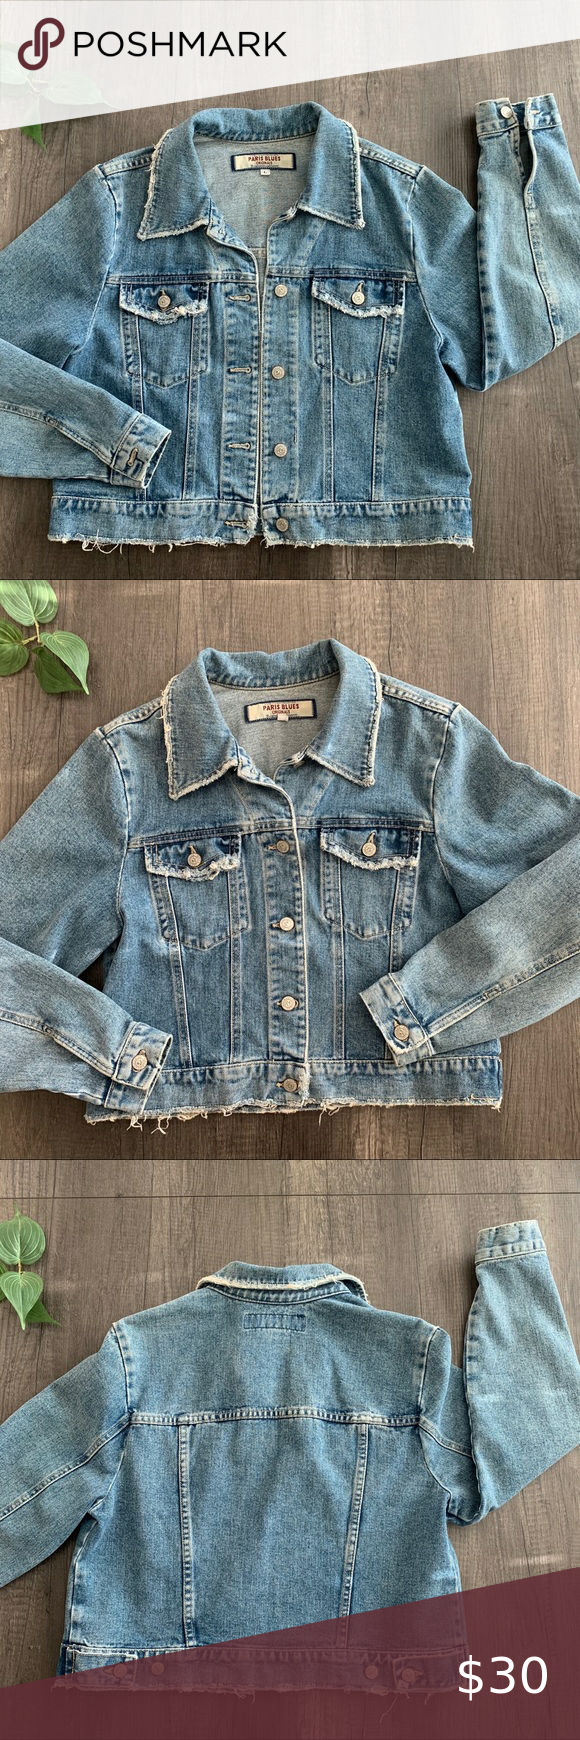 Paris Blues Originals Denim Jean Jacket In 2021 Original Denim Jeans Coats Jackets Women Long Sleeve Jean Jacket [ 1740 x 580 Pixel ]